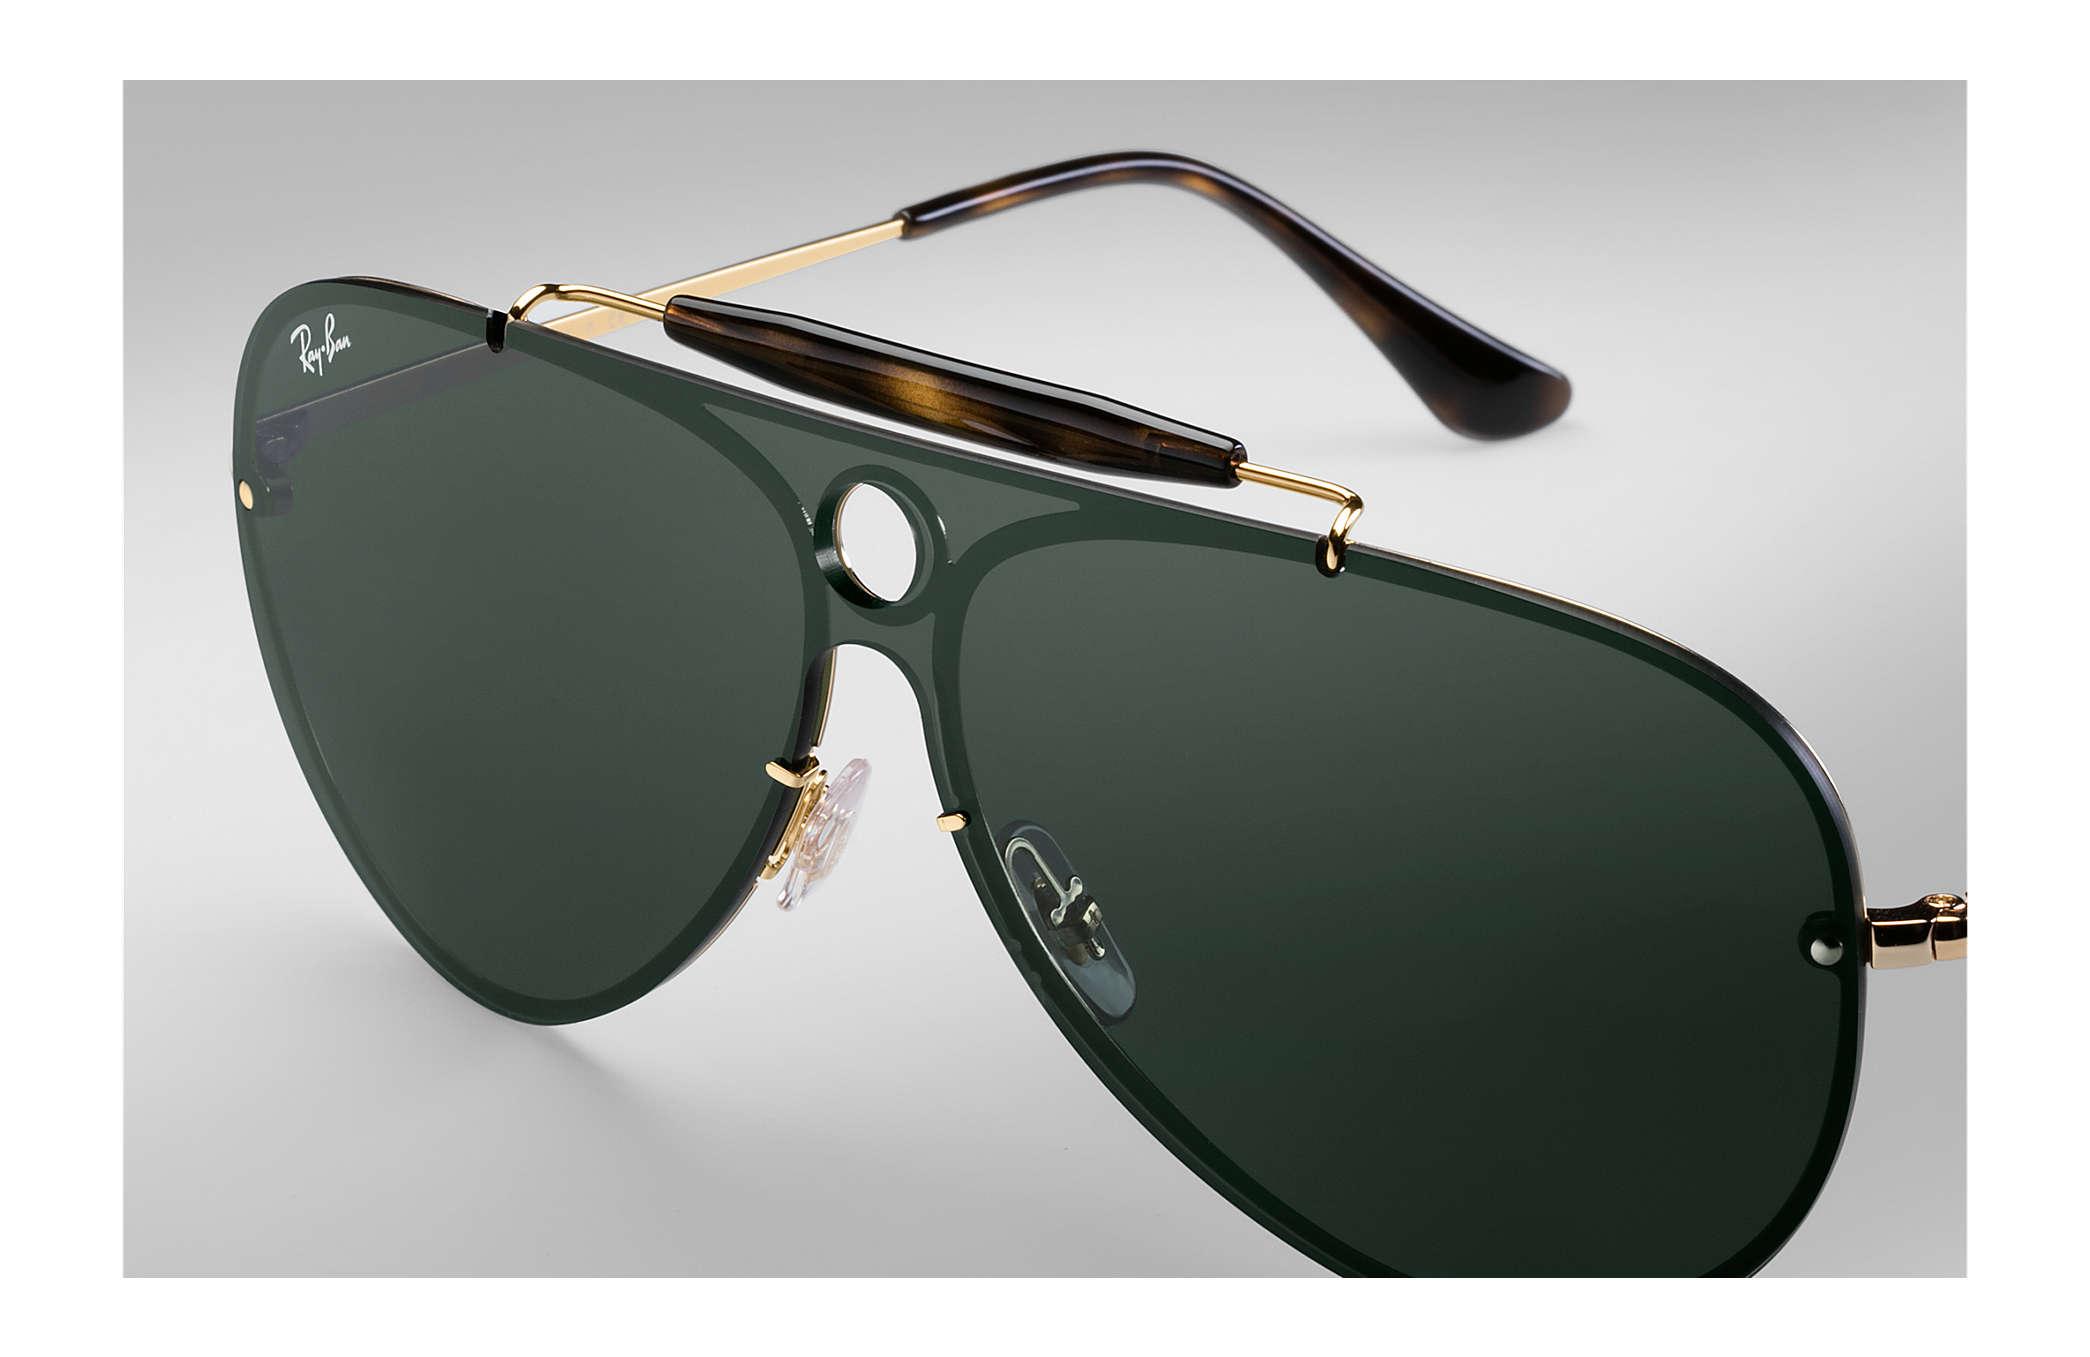 ray ban sunglasses price